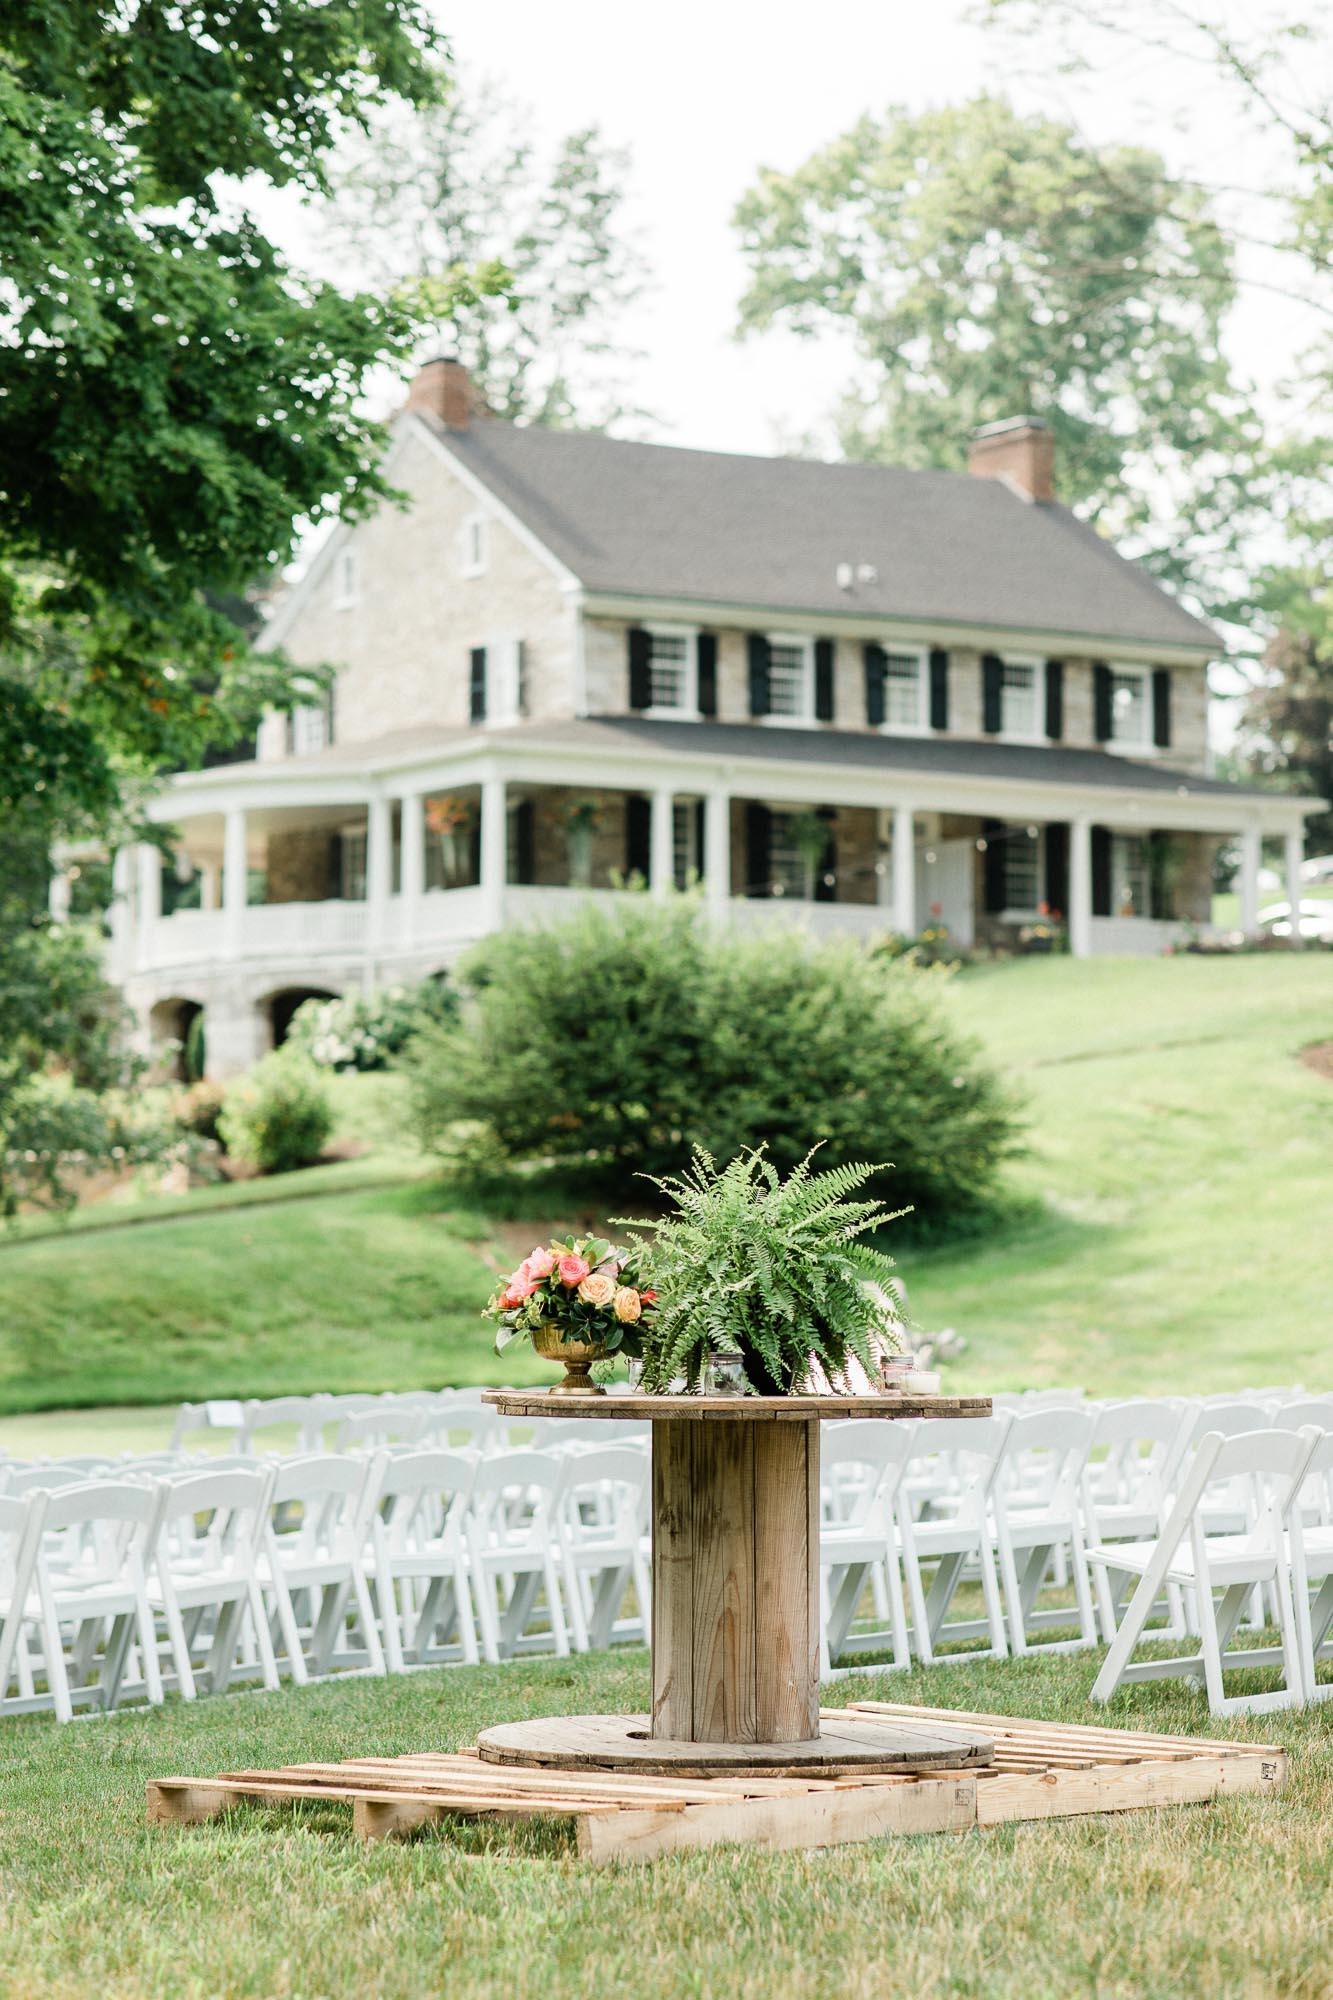 Allenberry-resort-historic-pennsylvania-wedding-21777.jpg